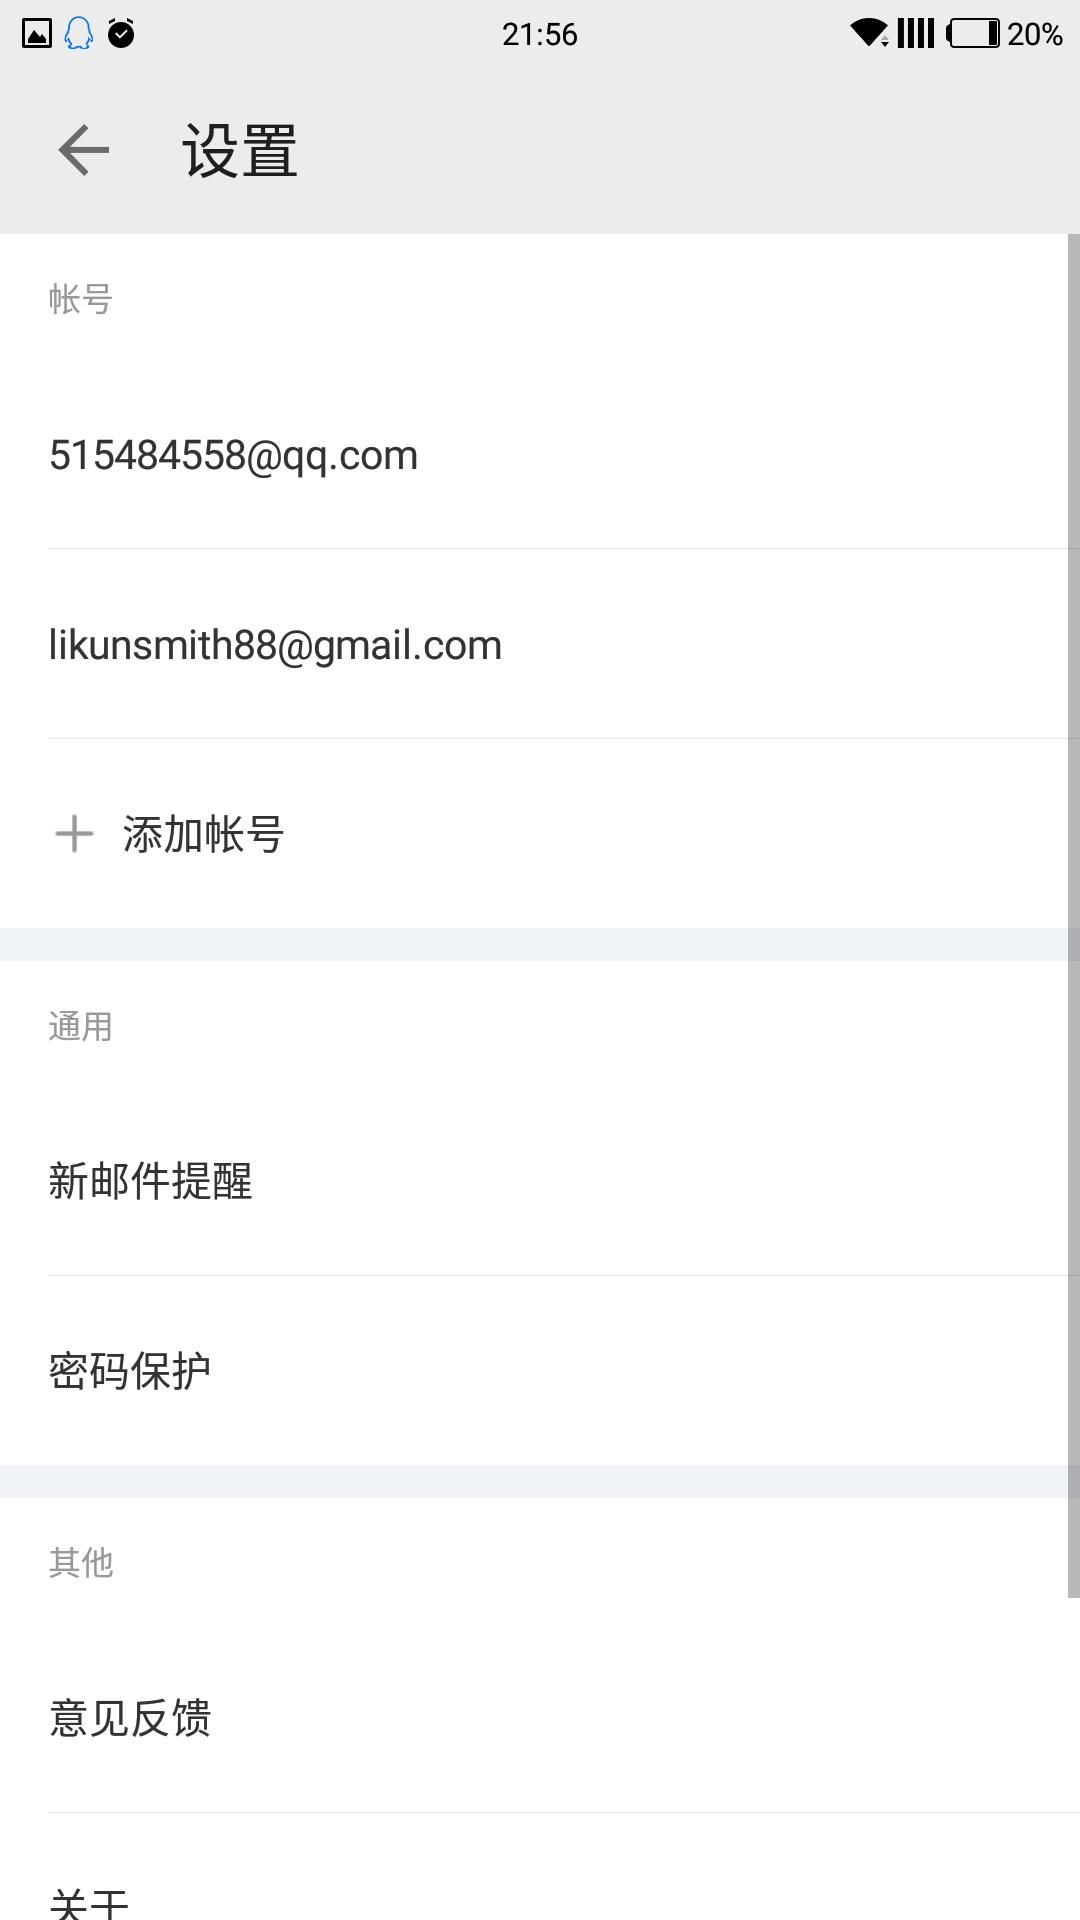 Screenshot_20160603-215616.png